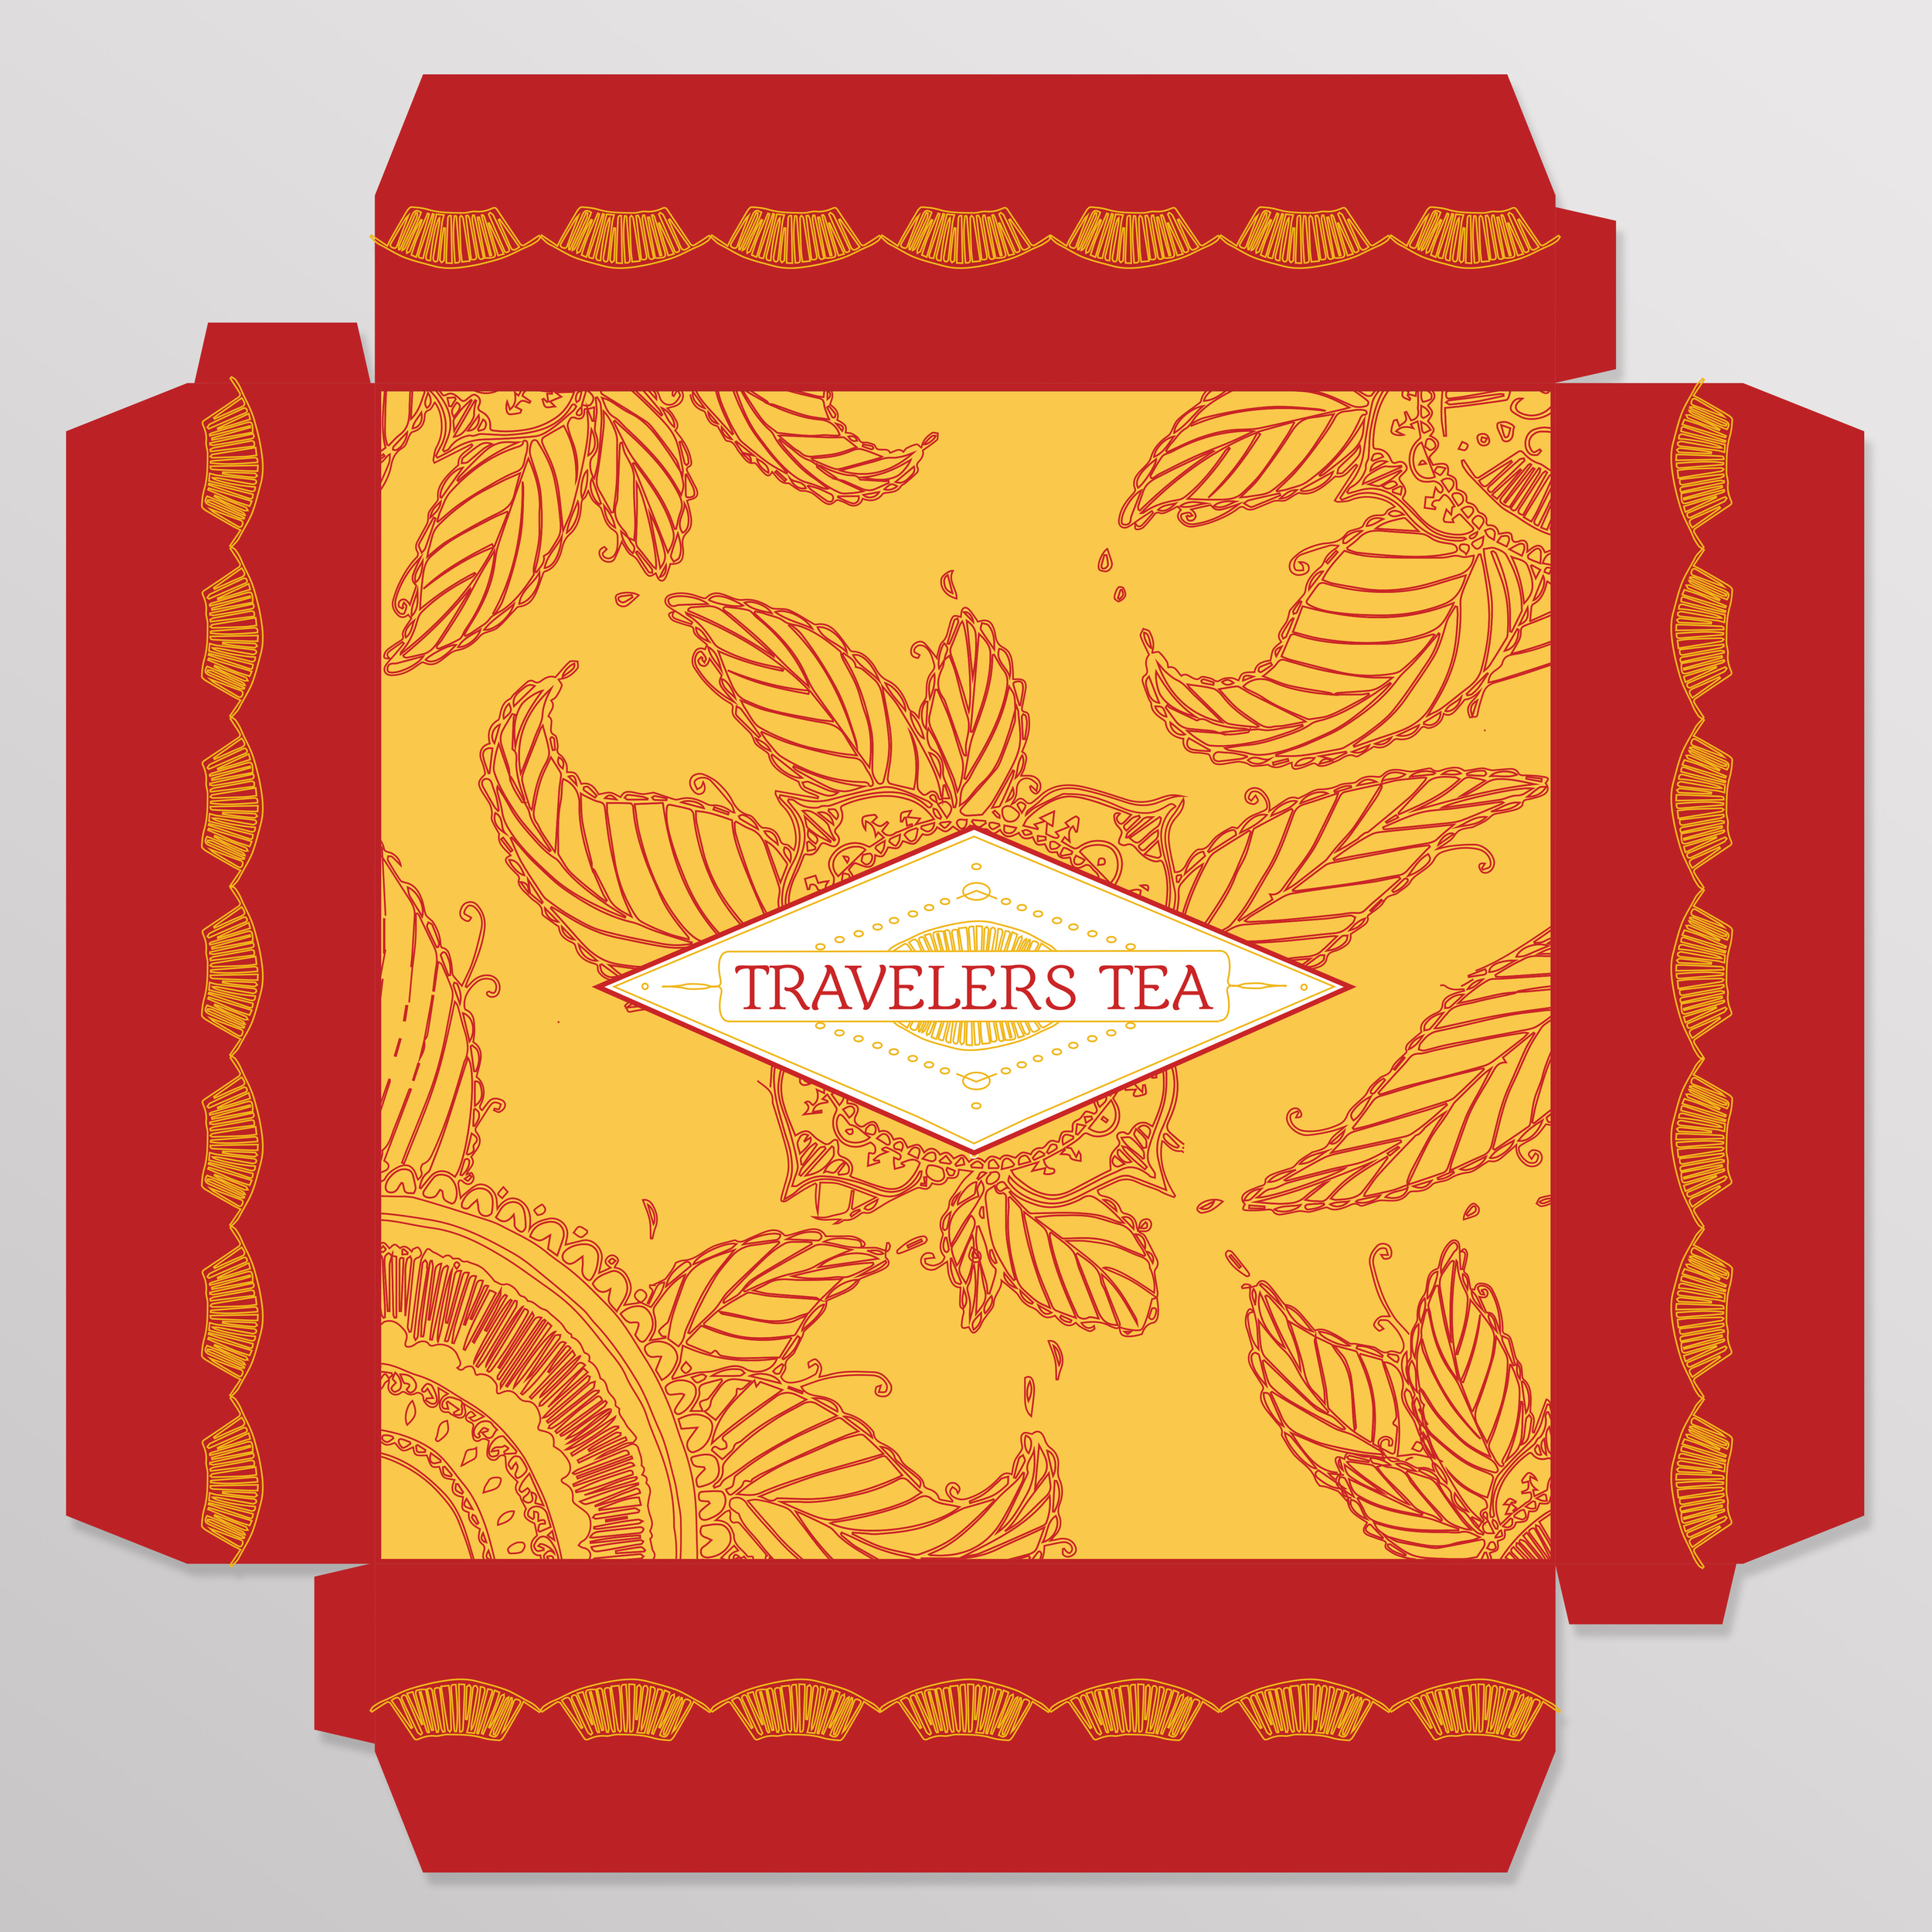 TravelersTea_BoxTop2.jpg